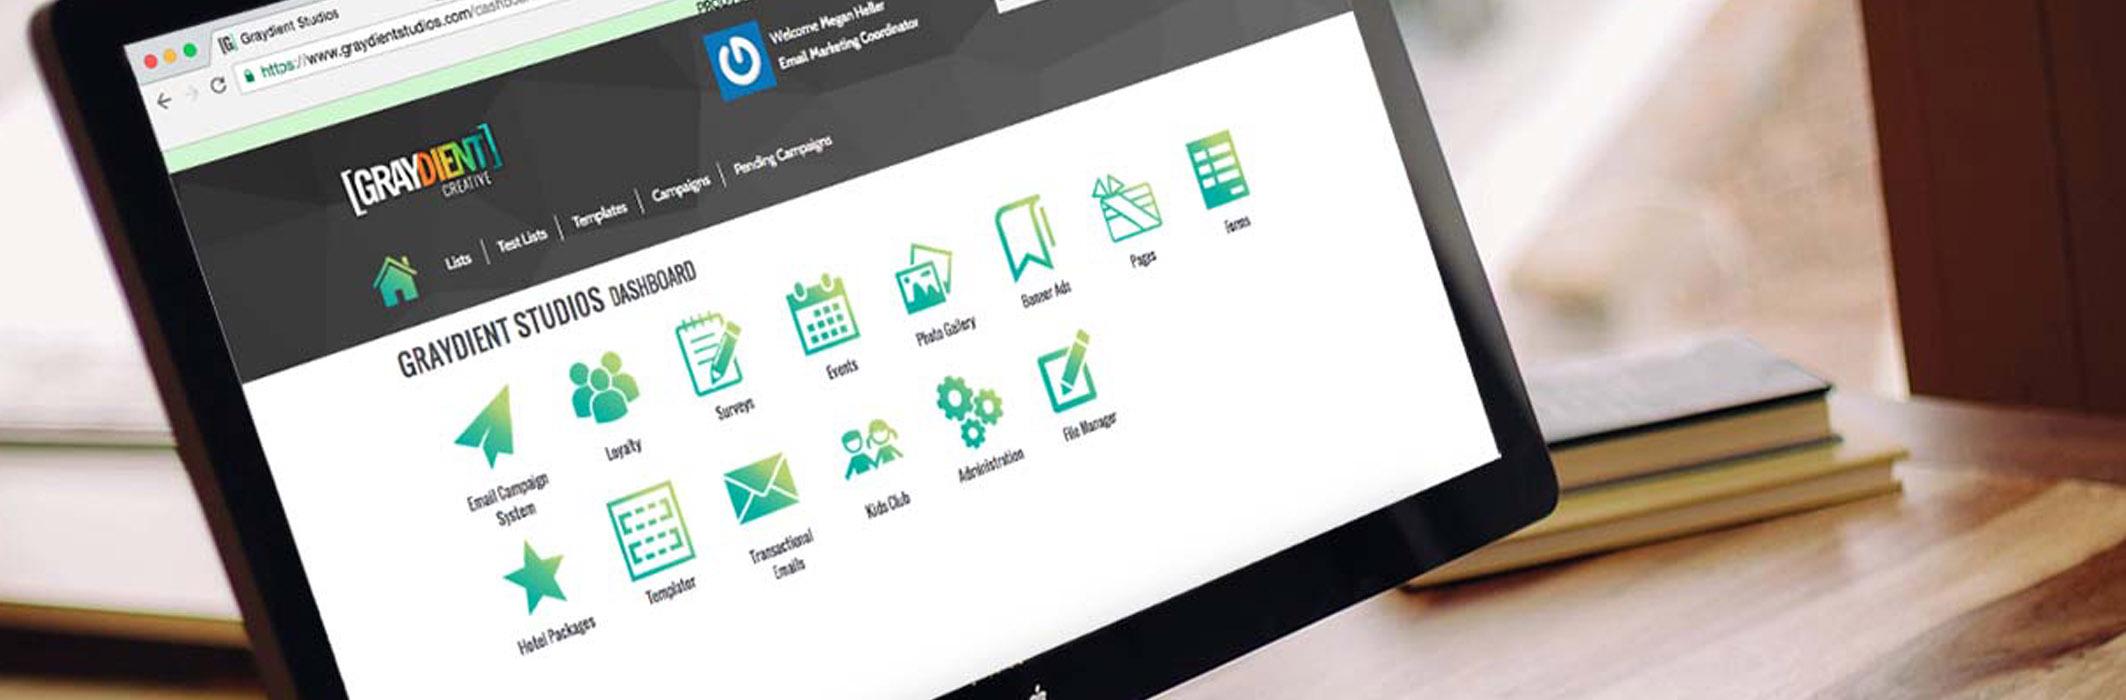 website and web application development